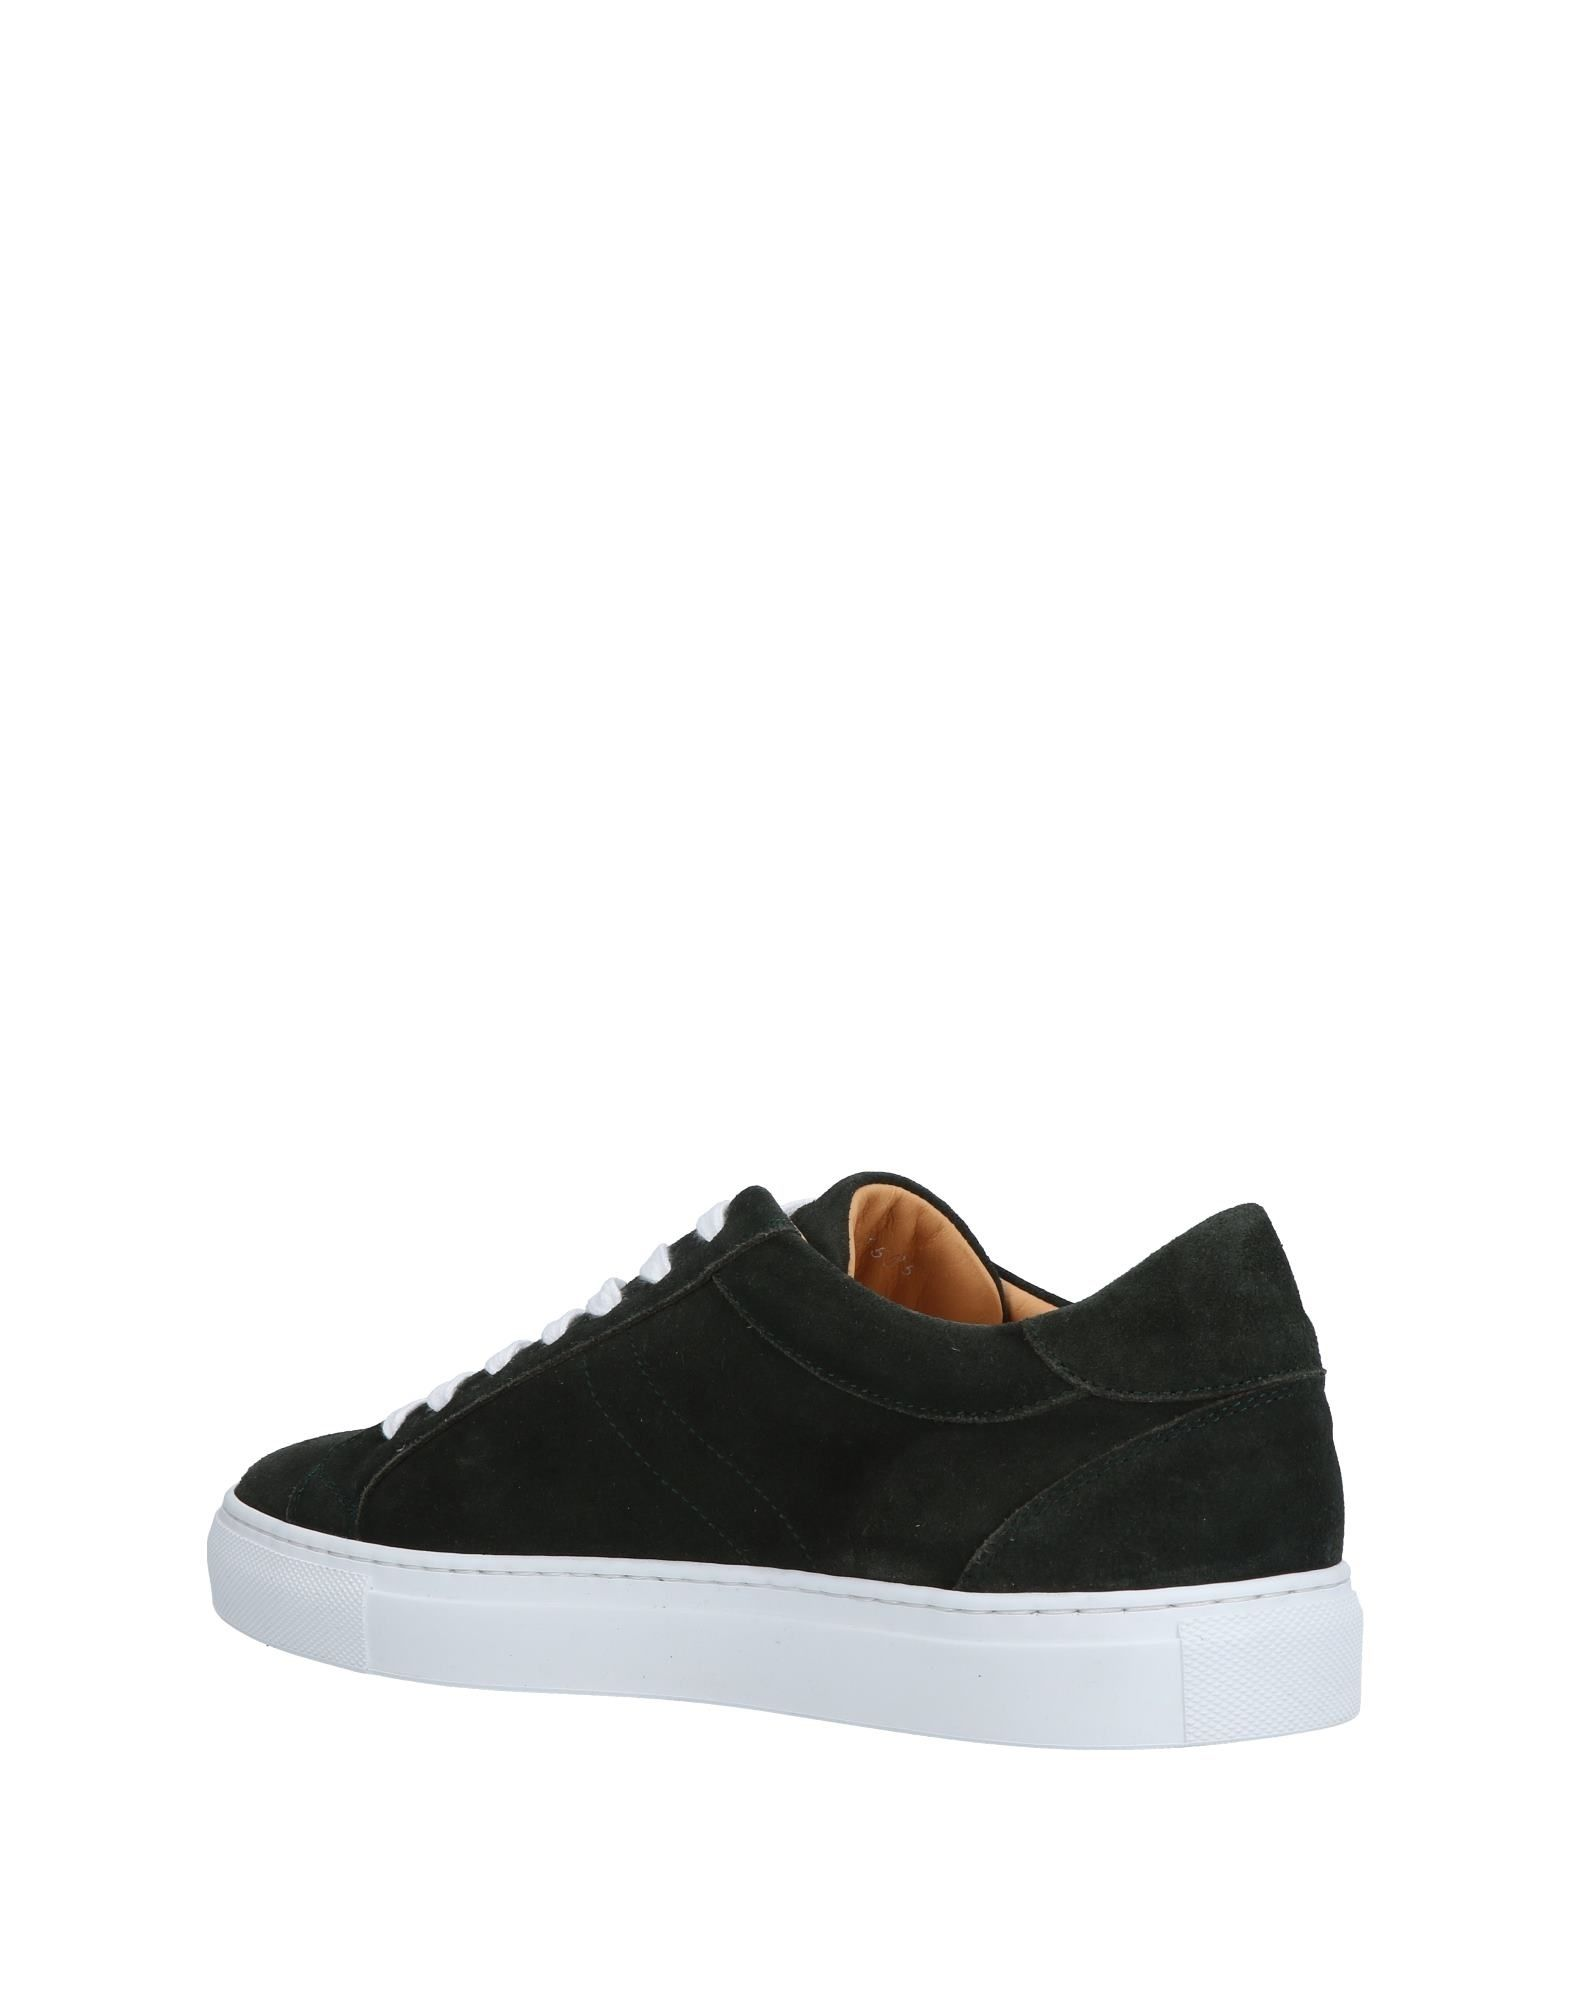 Pellettieri Di  Parma Sneakers Herren  11505347NE Gute Qualität beliebte Schuhe